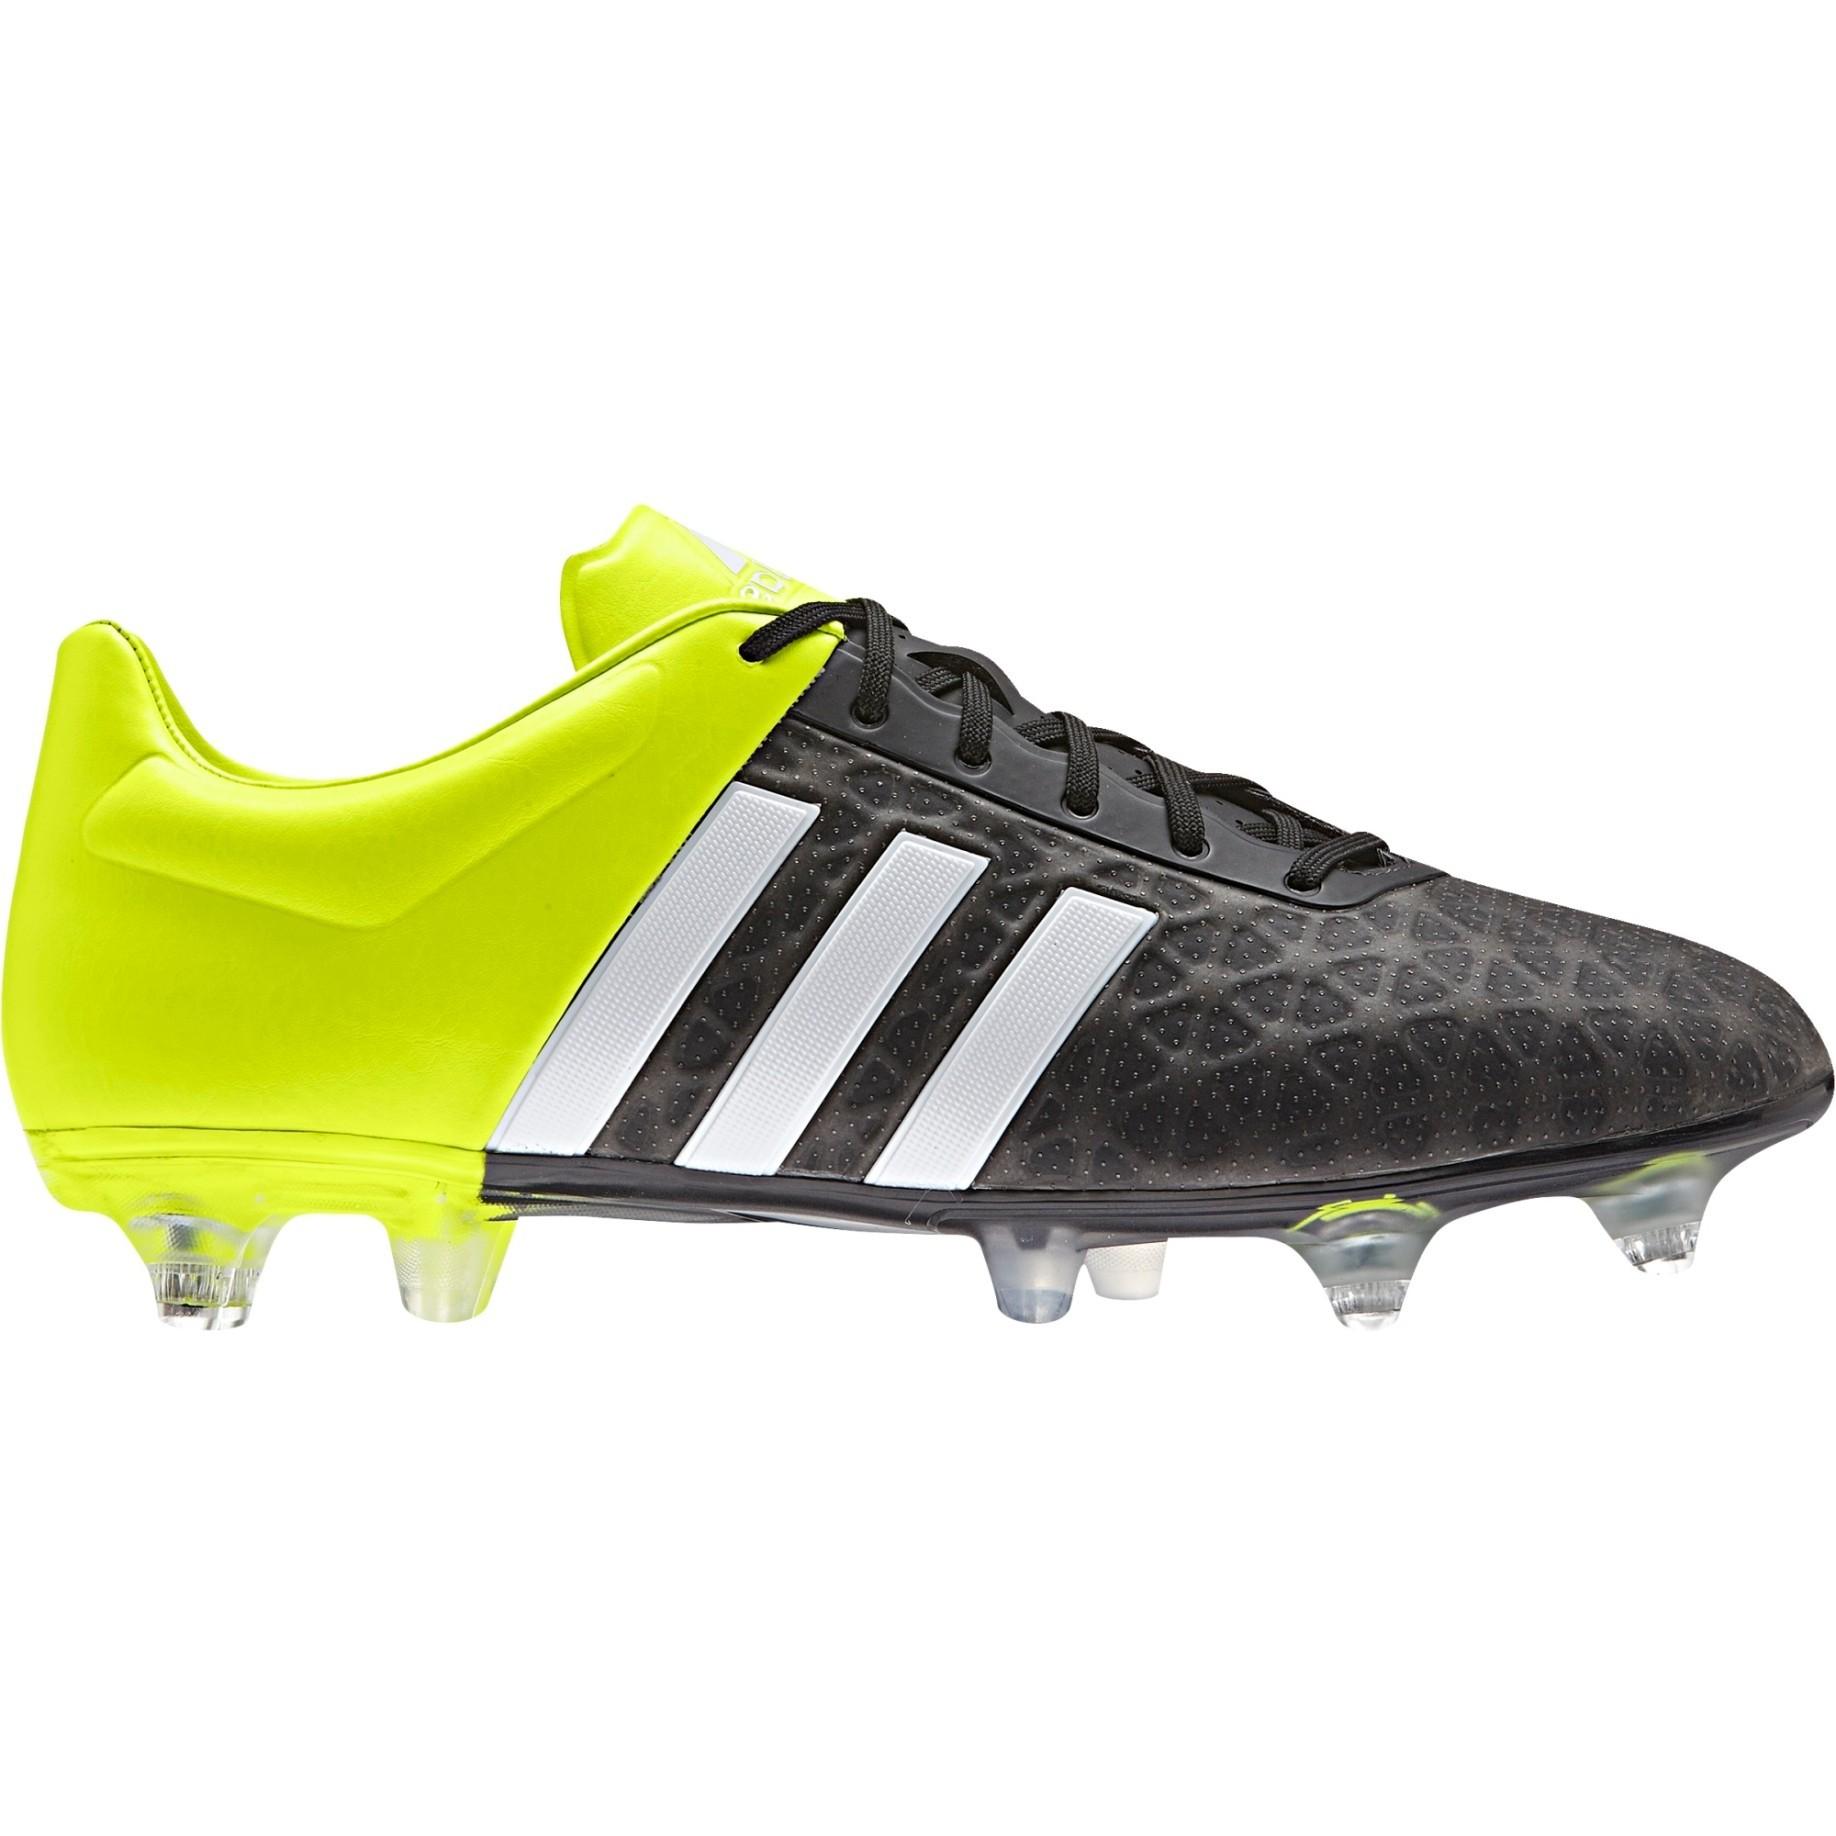 adidas ace scarpe calcio uomo